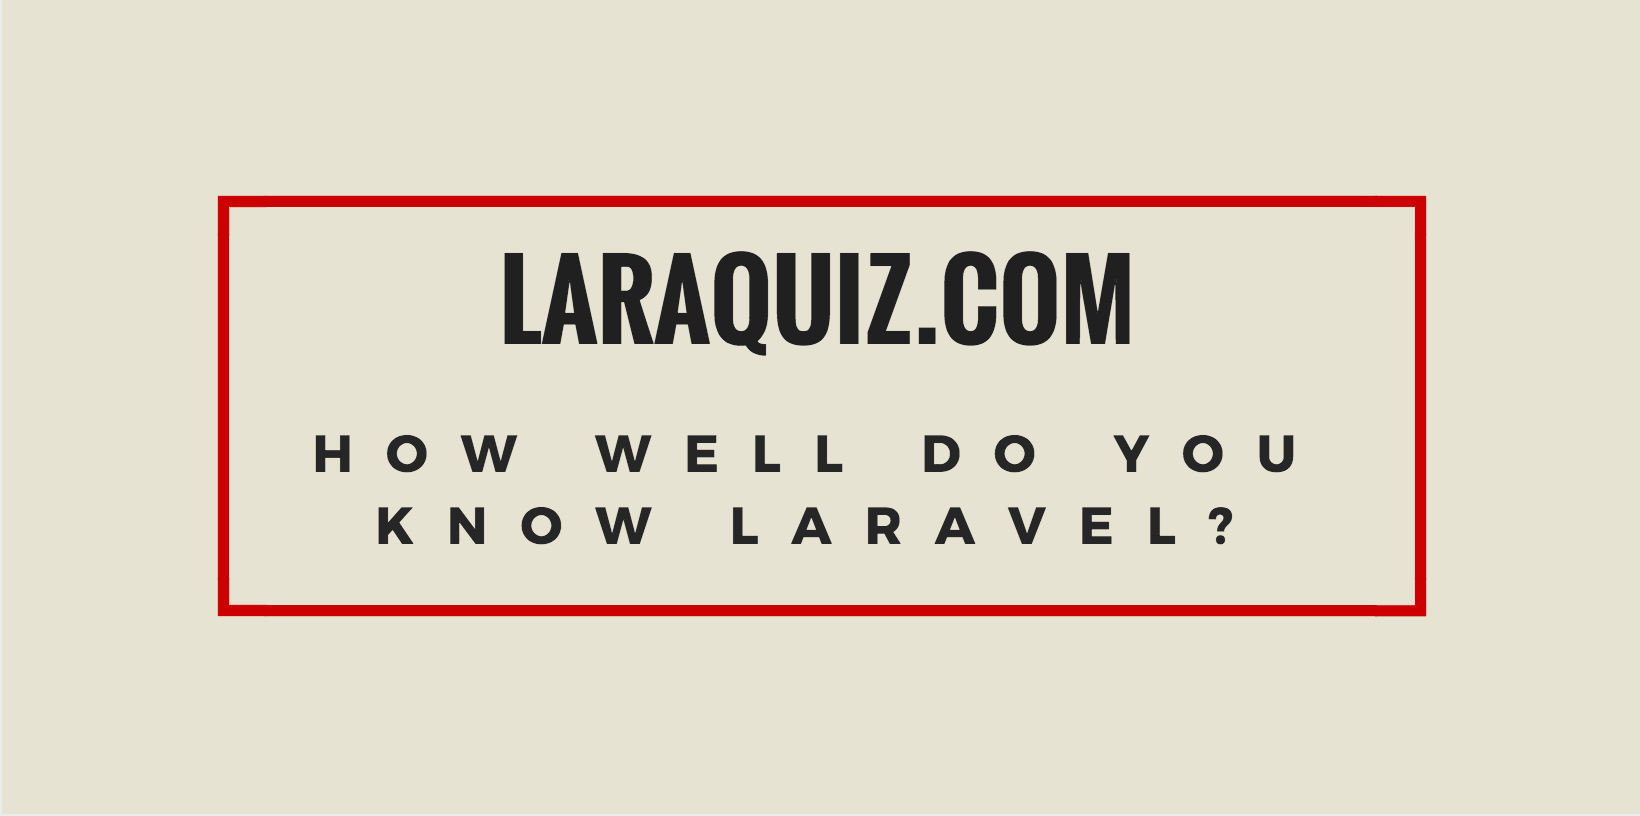 laraquiz - test your laravel knowledge